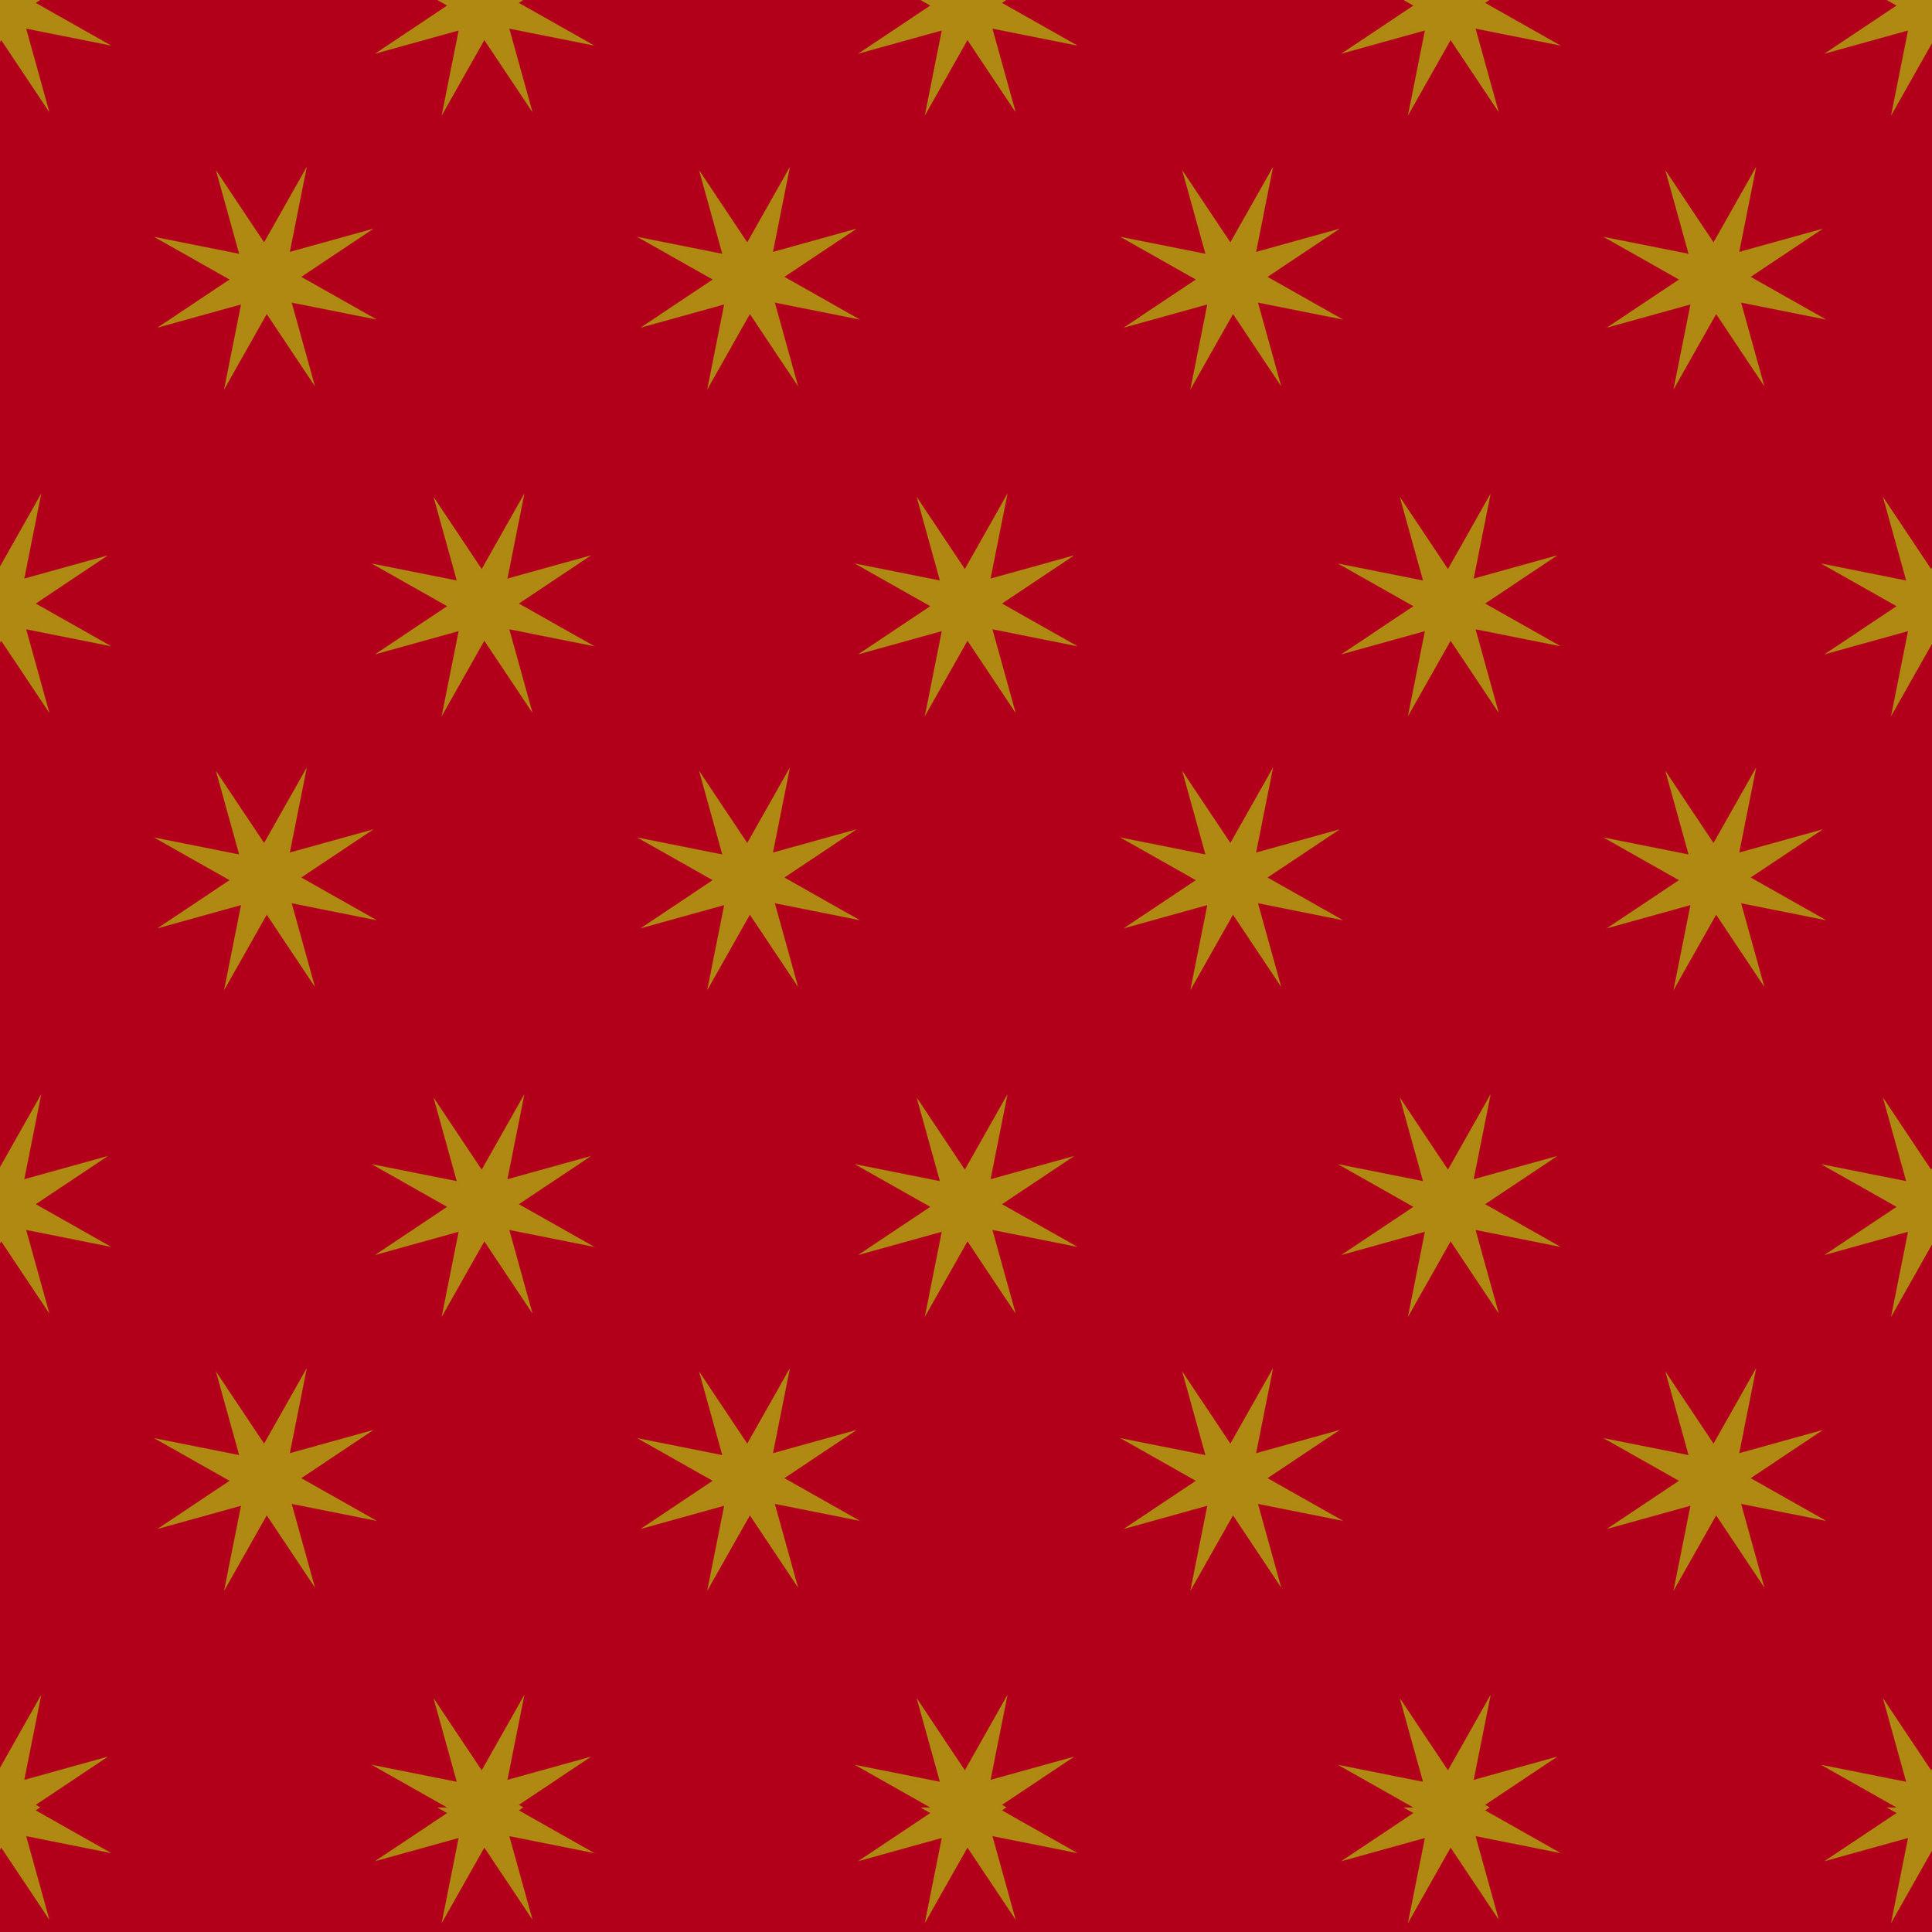 C4743-RED_LaVieBoheme_Stars_300dpi.jpg